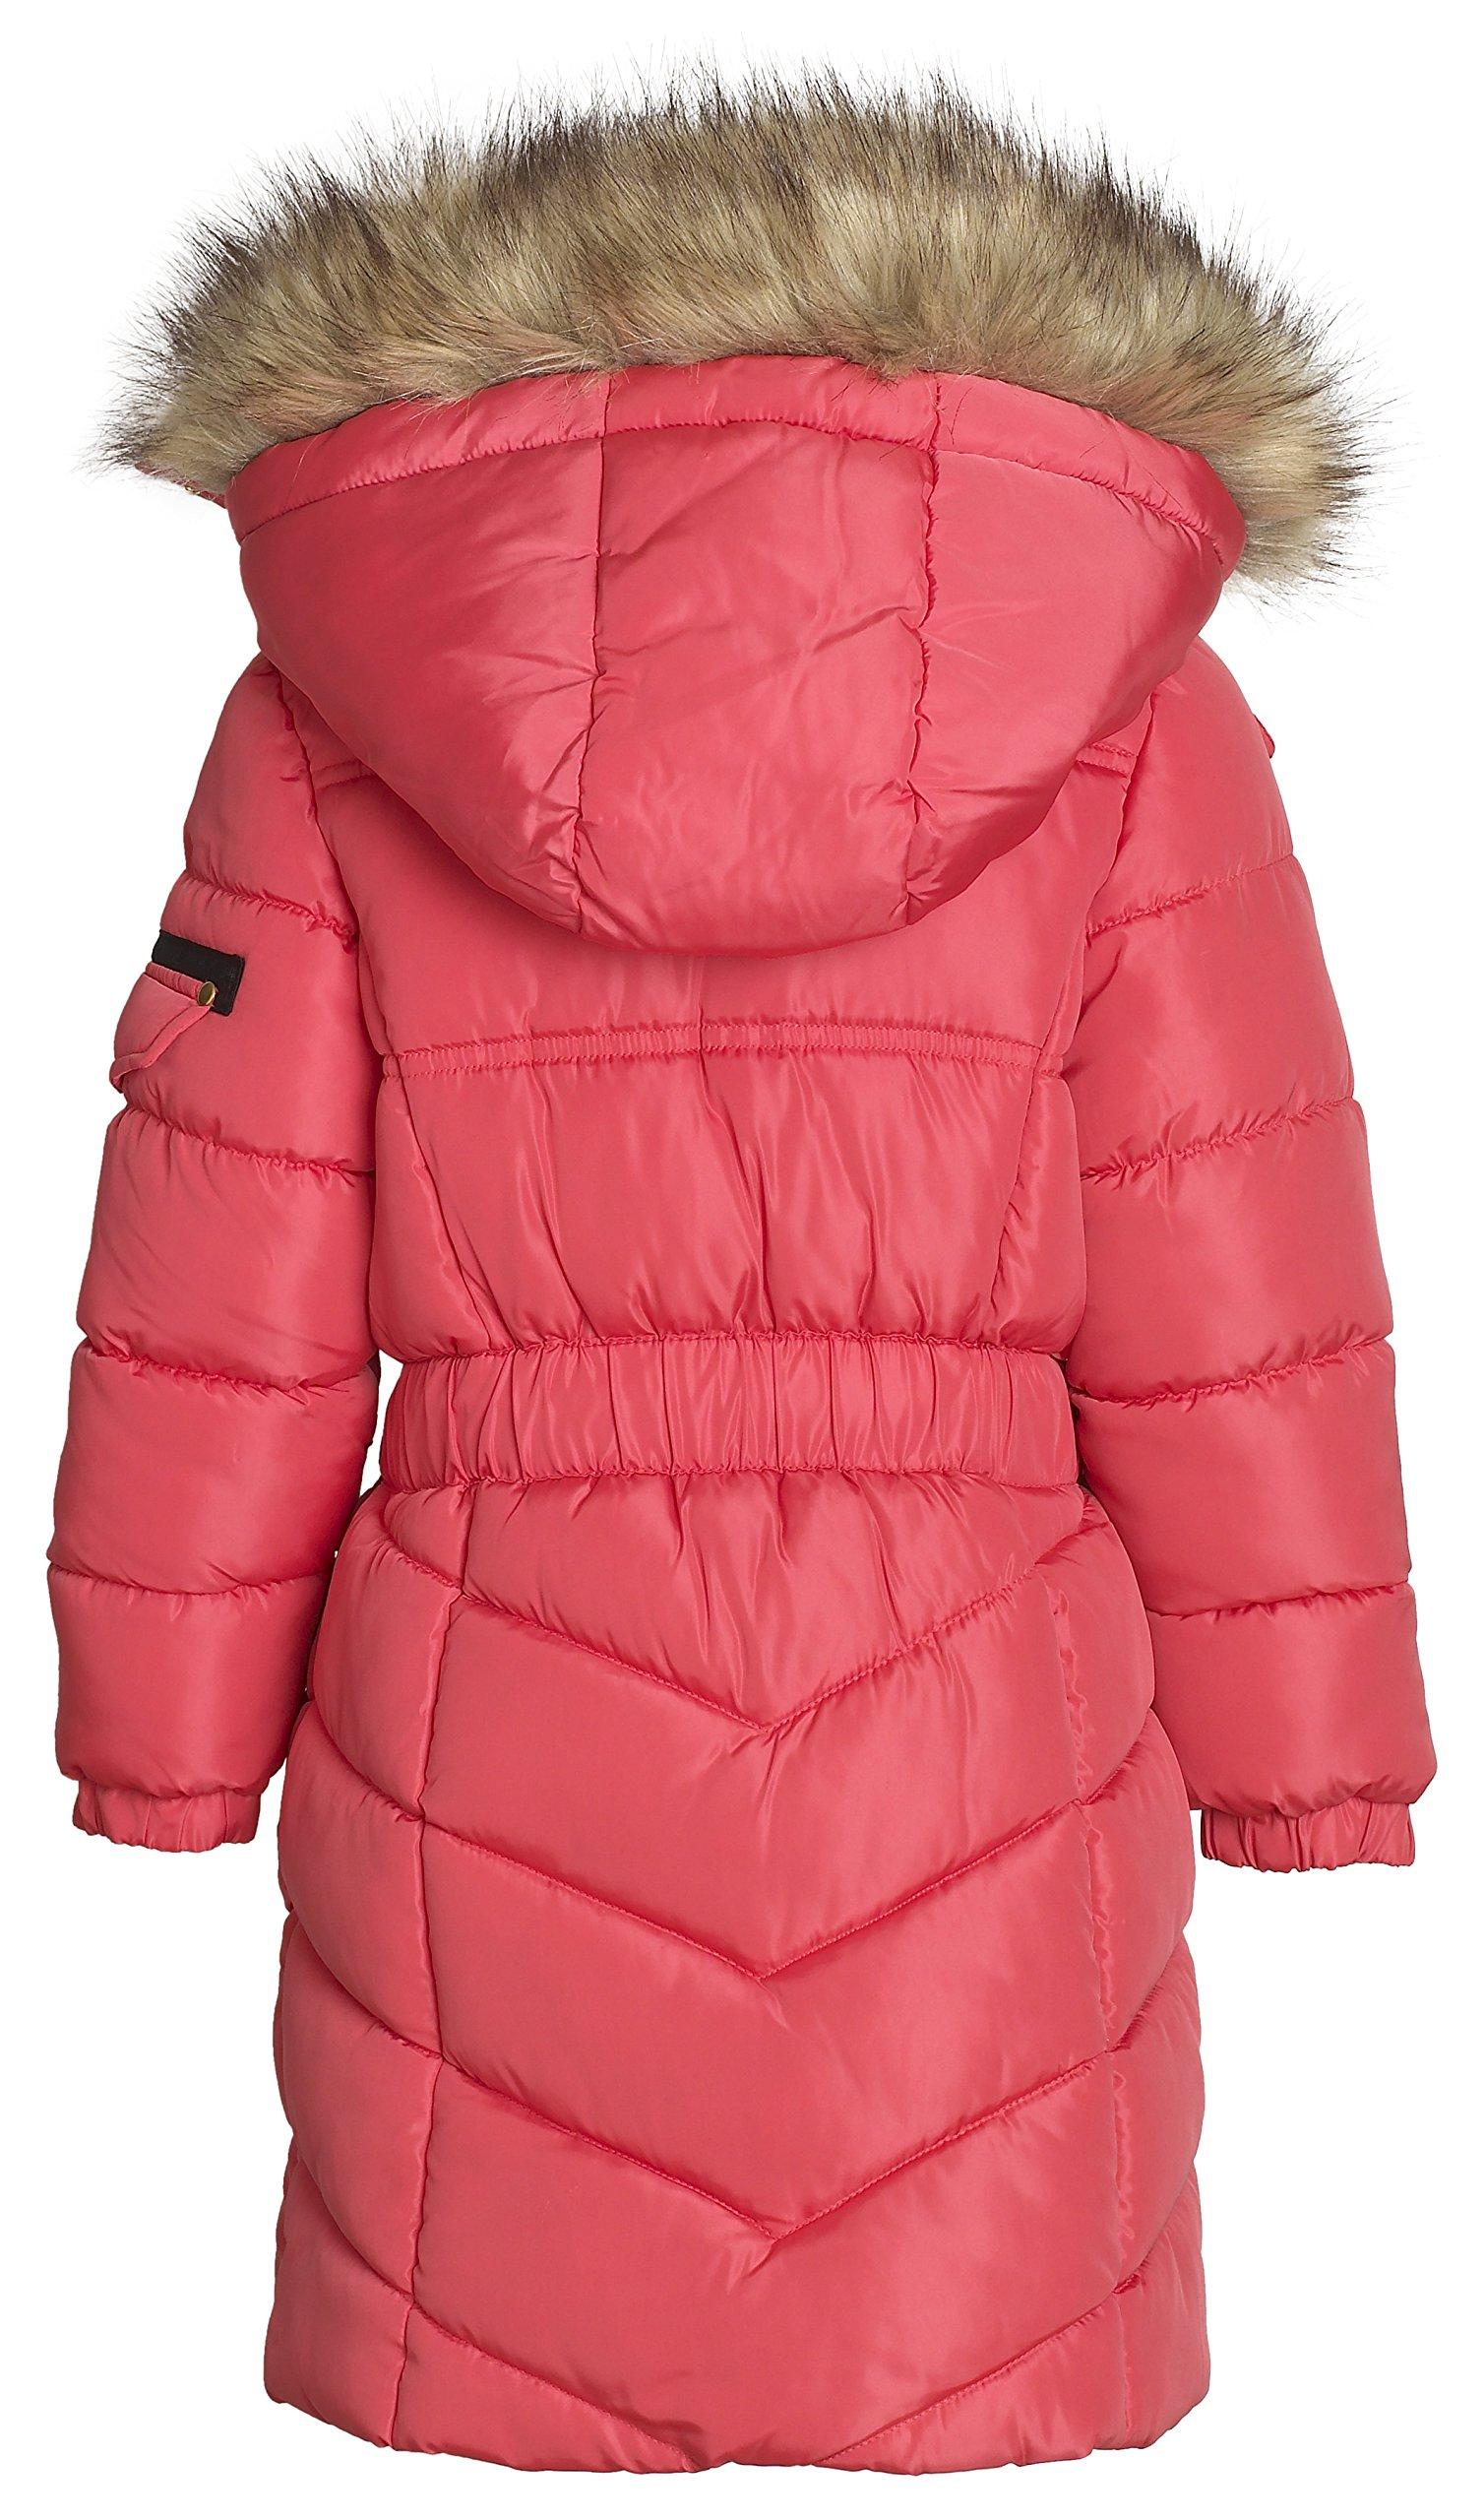 Sportoli Girls' Winter Heavy Quilt Padded Puffer Jacket Plush Lined Hooded Coat (Hibiscus, 7/8) by Sportoli (Image #2)